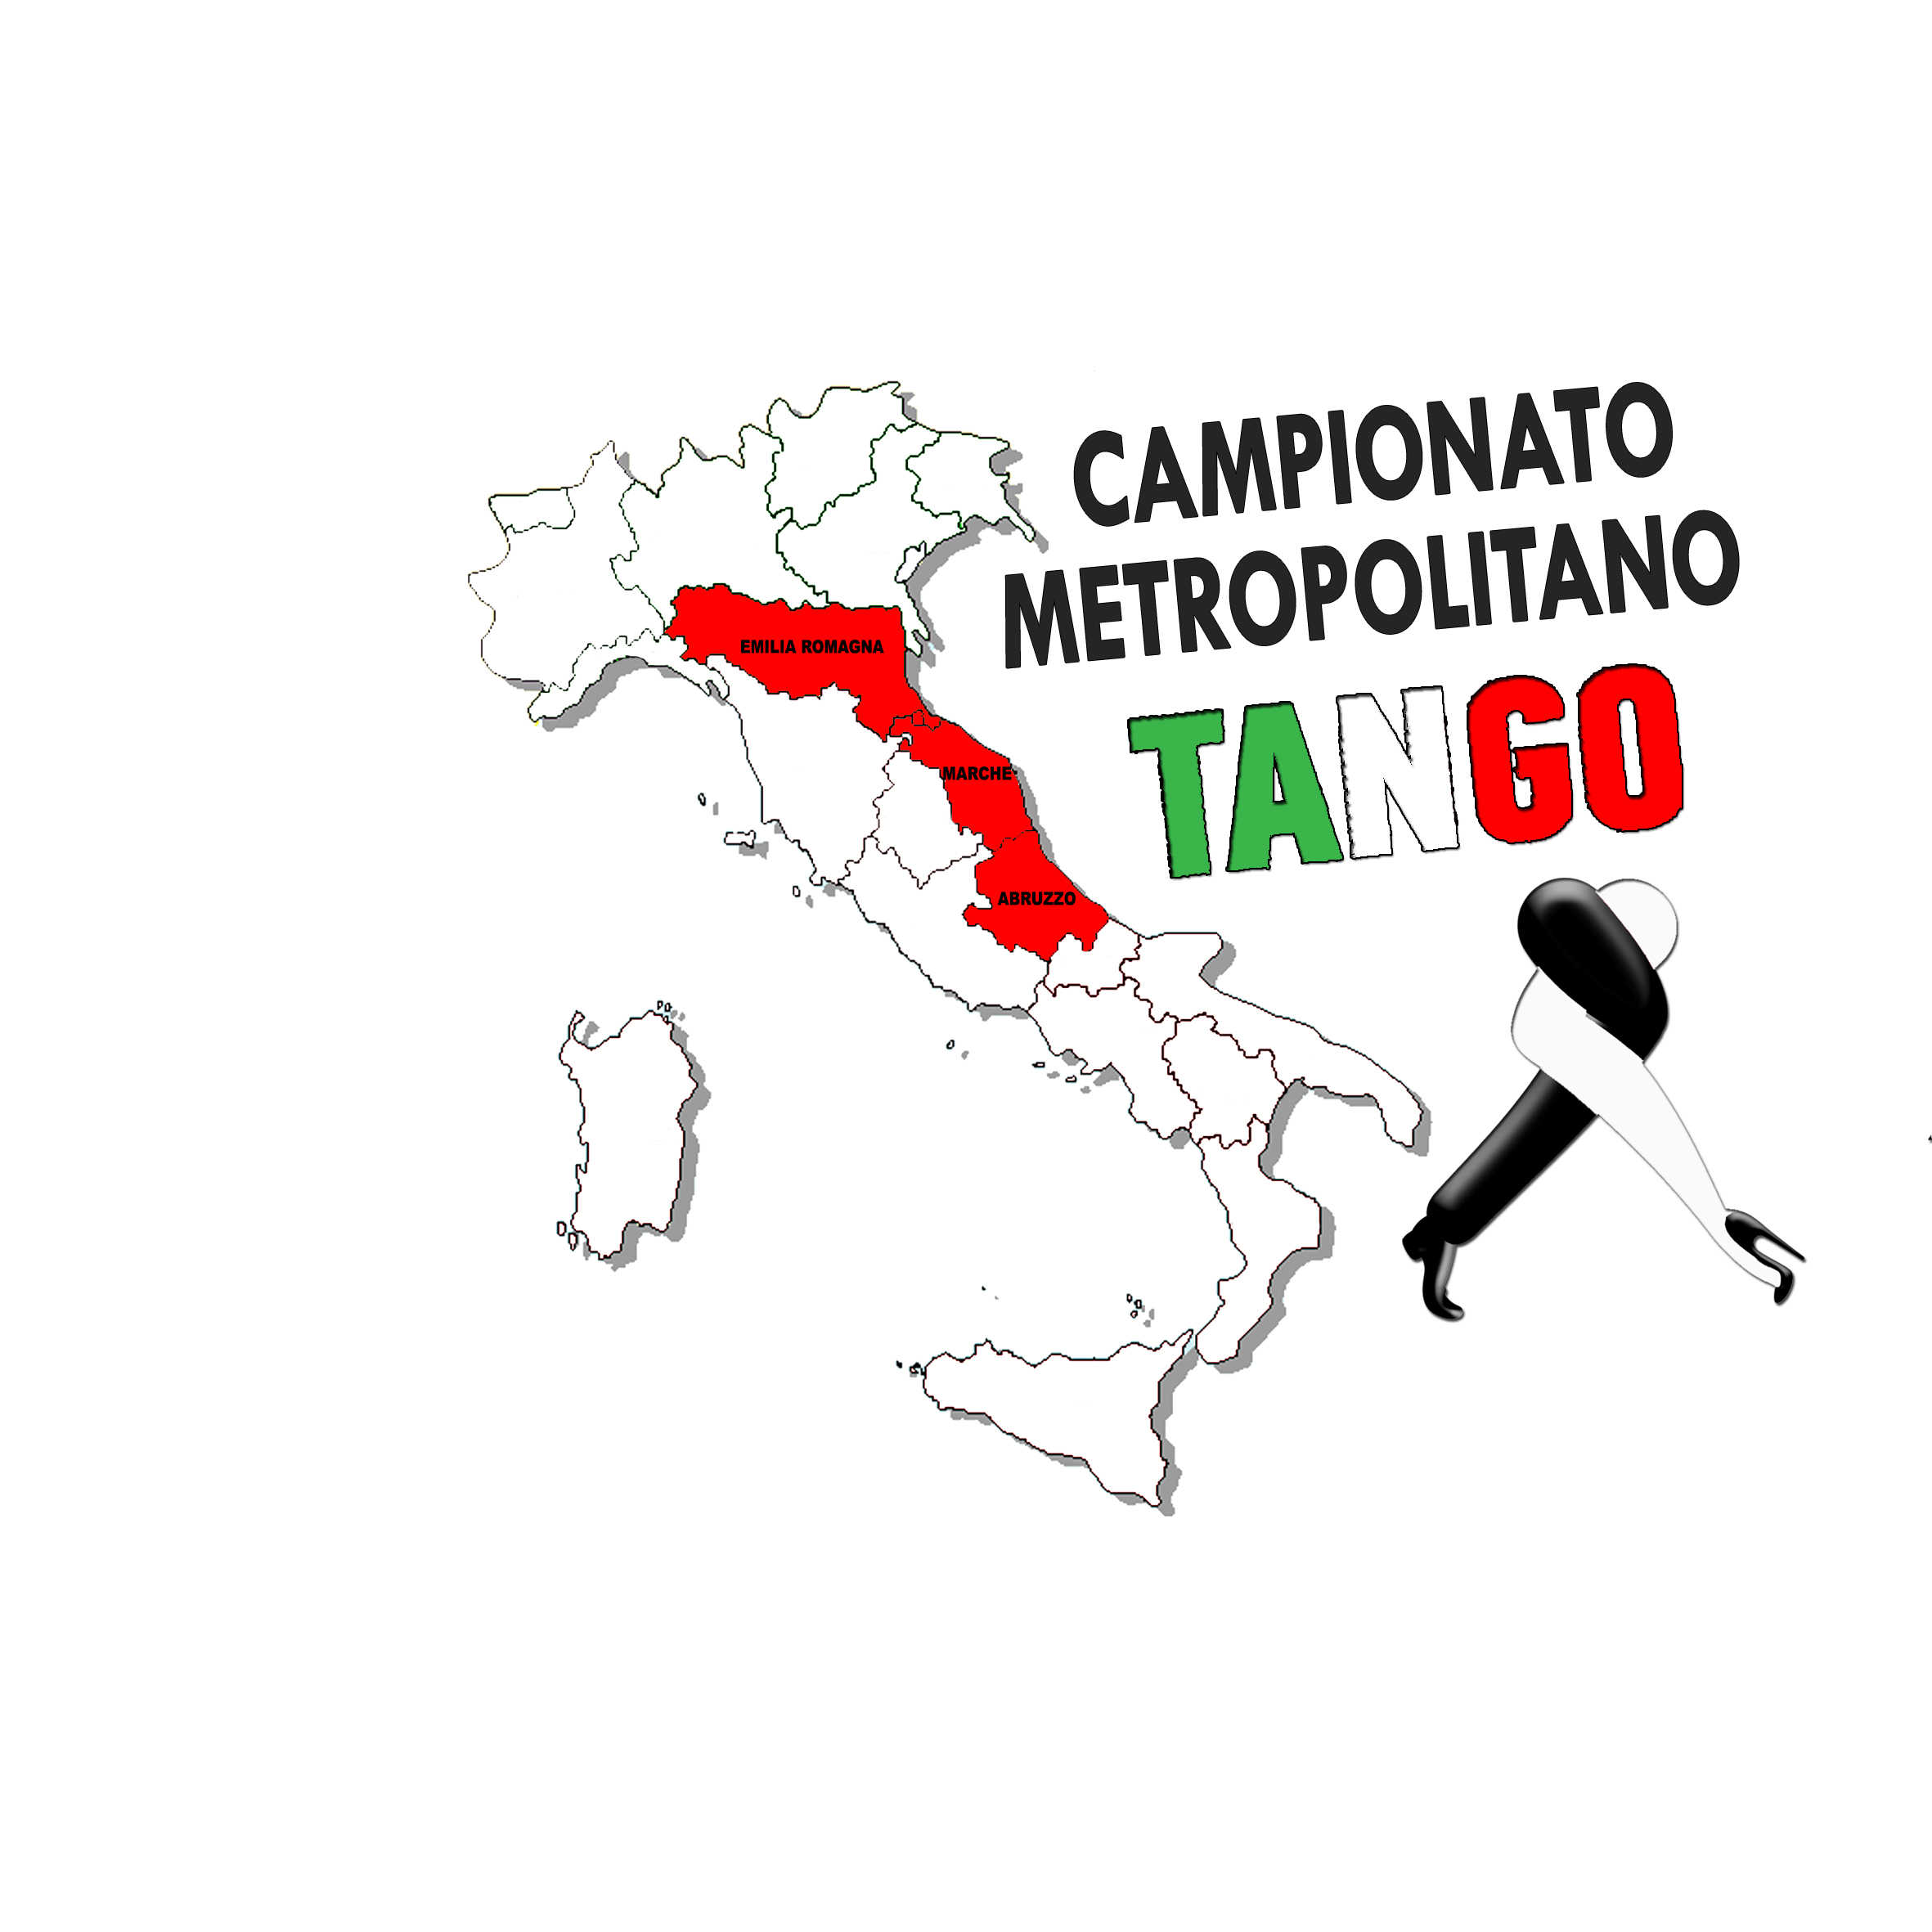 campionato metropolitano tango